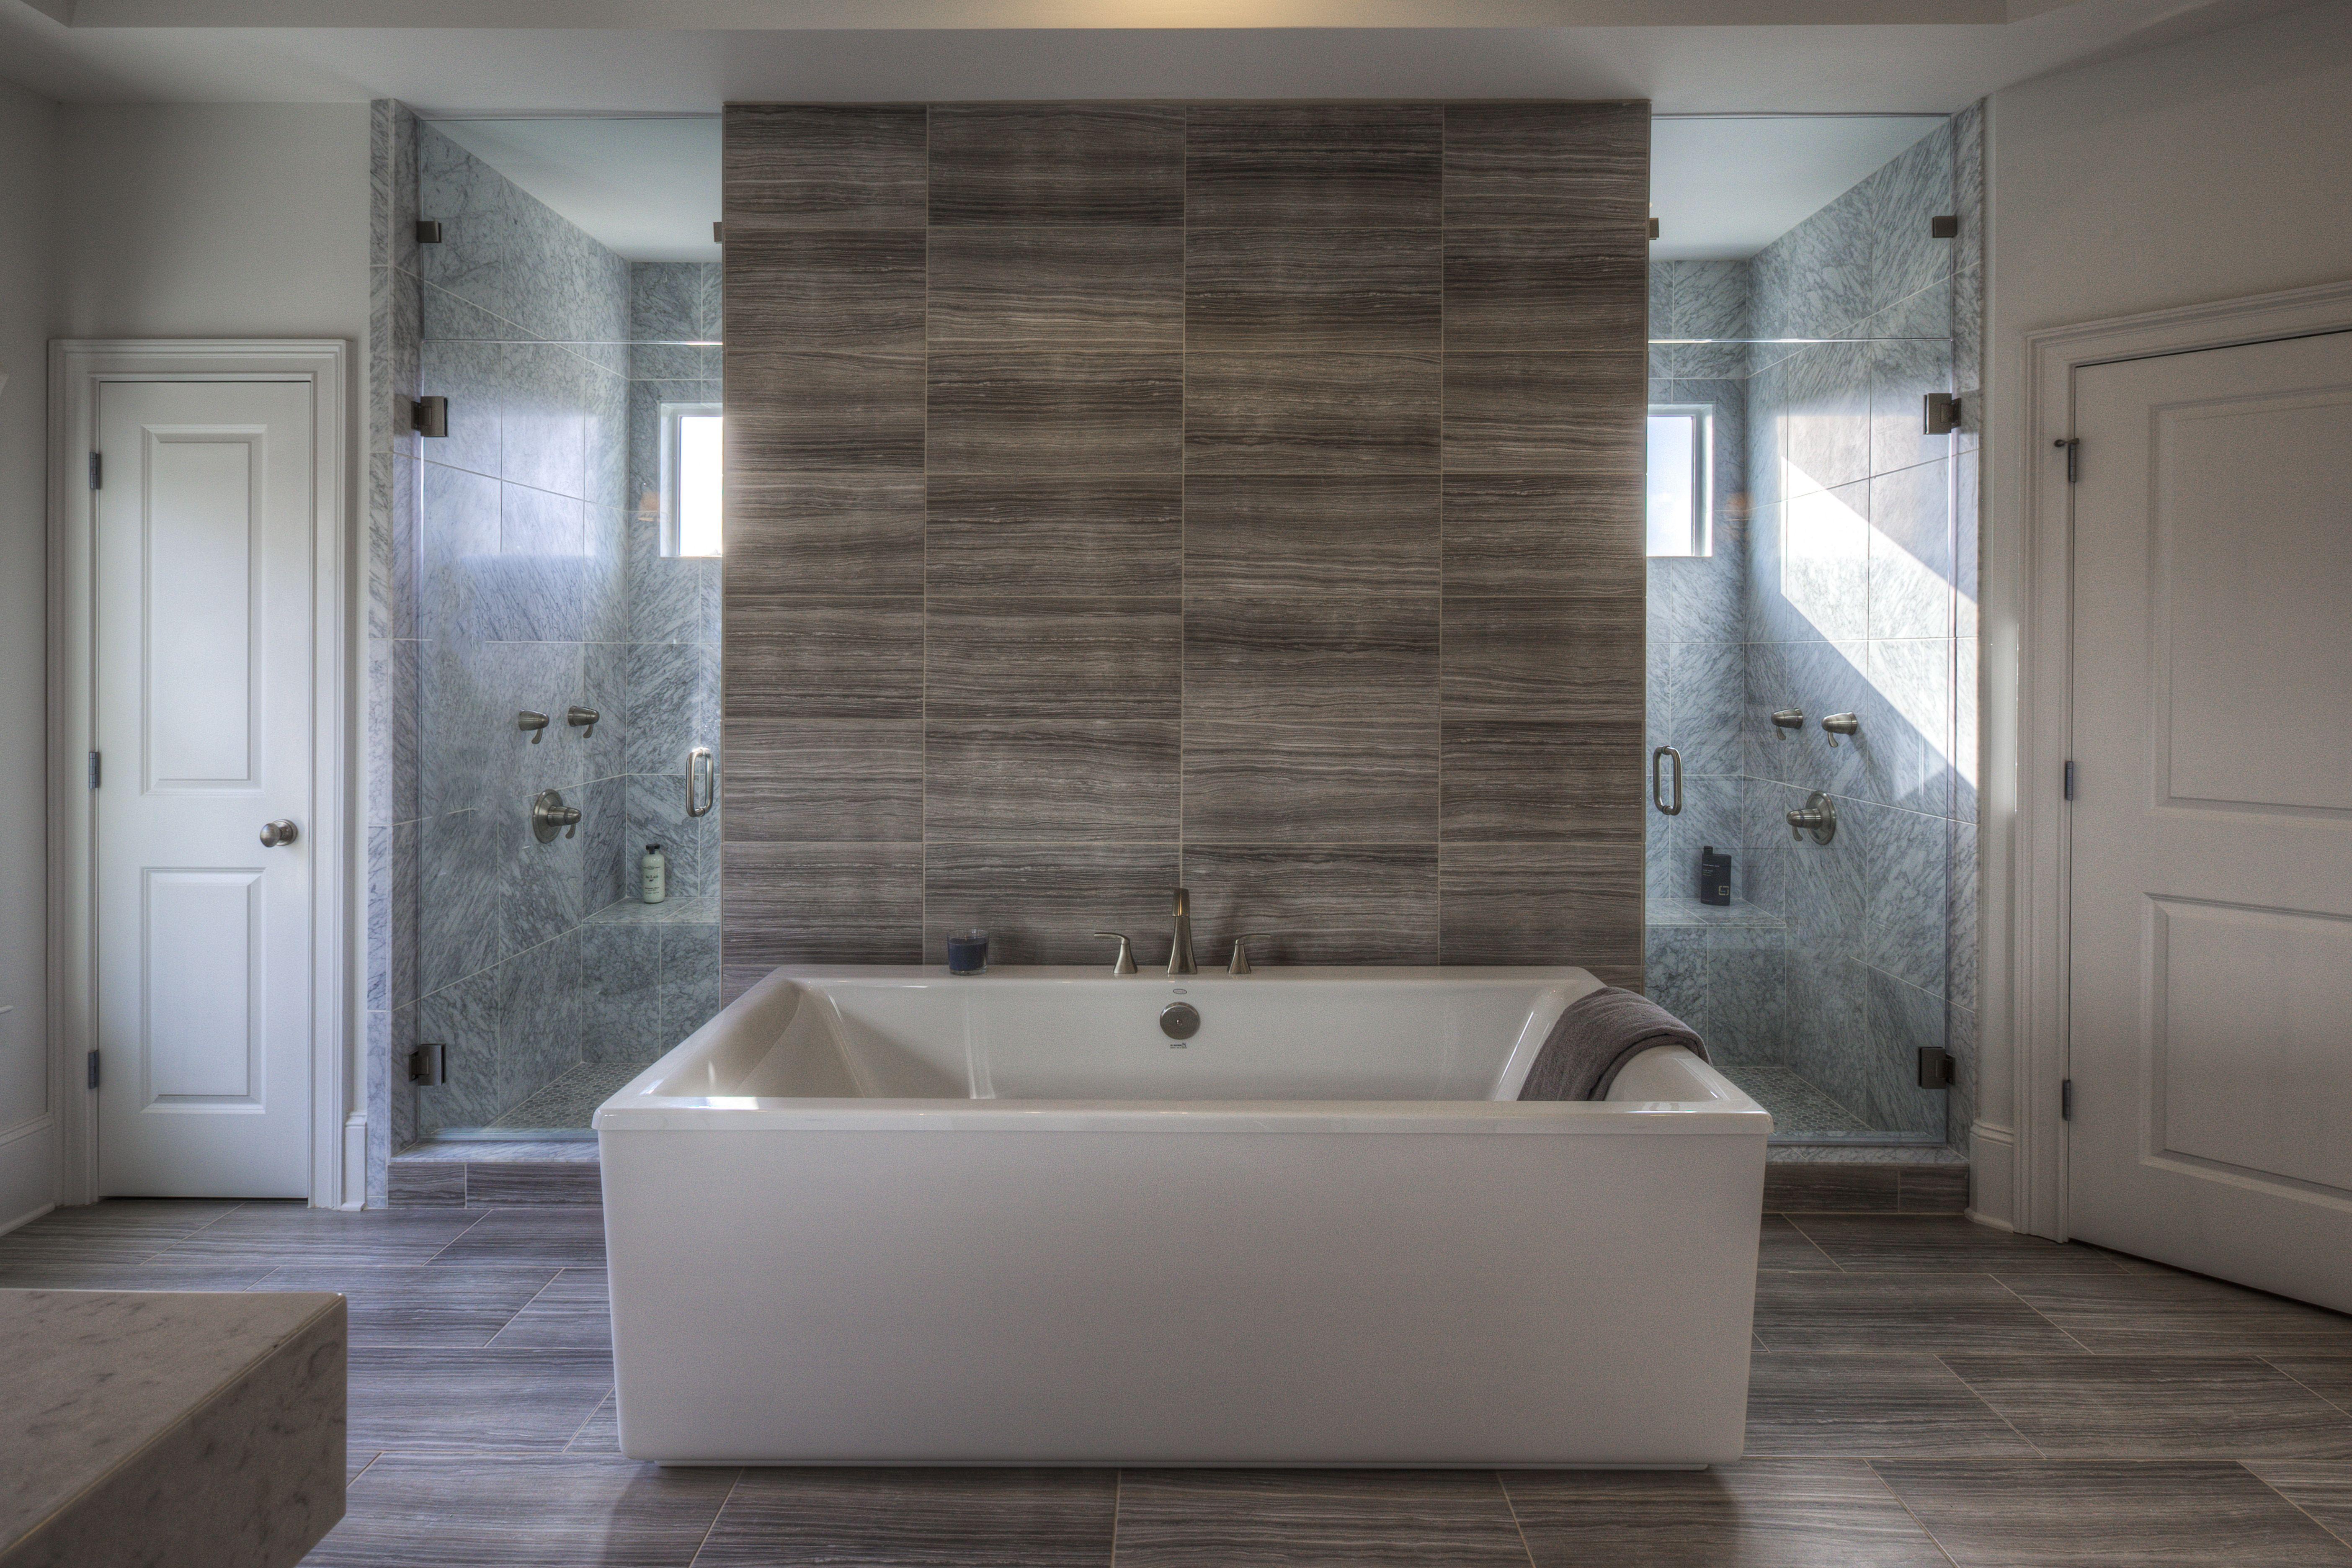 Inspiring Spaces Blog | Bathtubs, Tubs and Bath